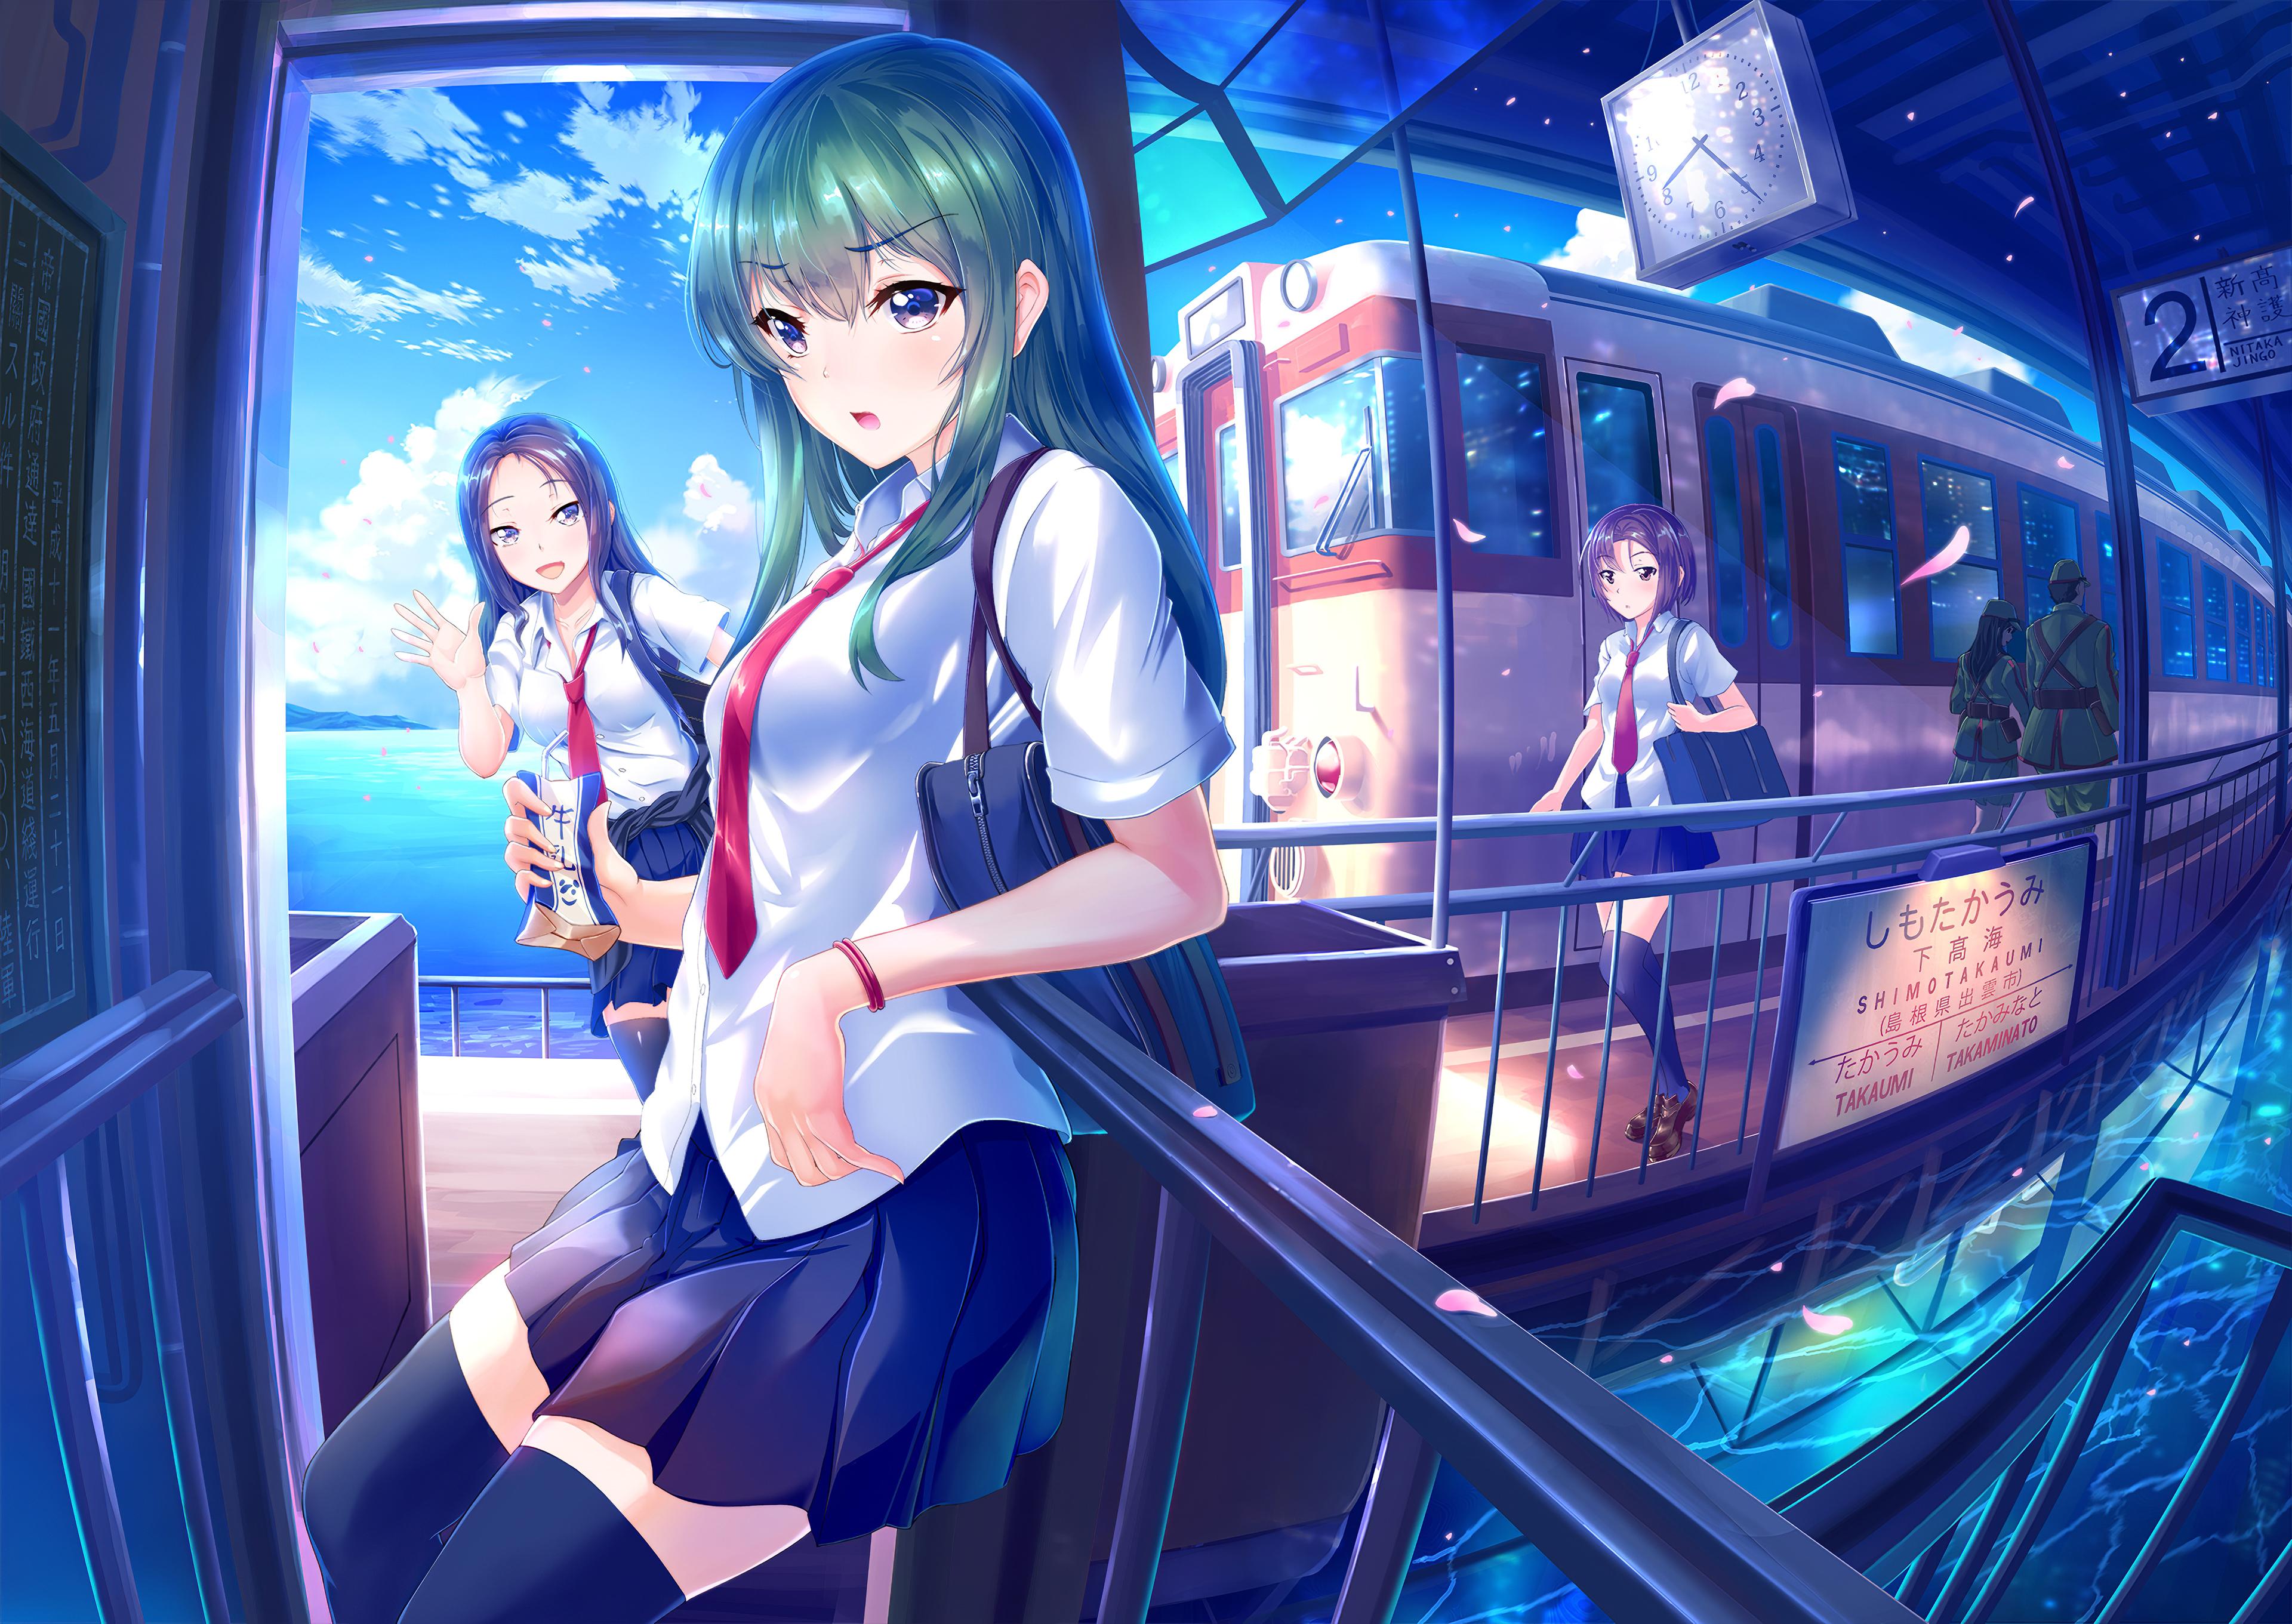 subway girls anime 1578254050 - Subway Girls Anime -